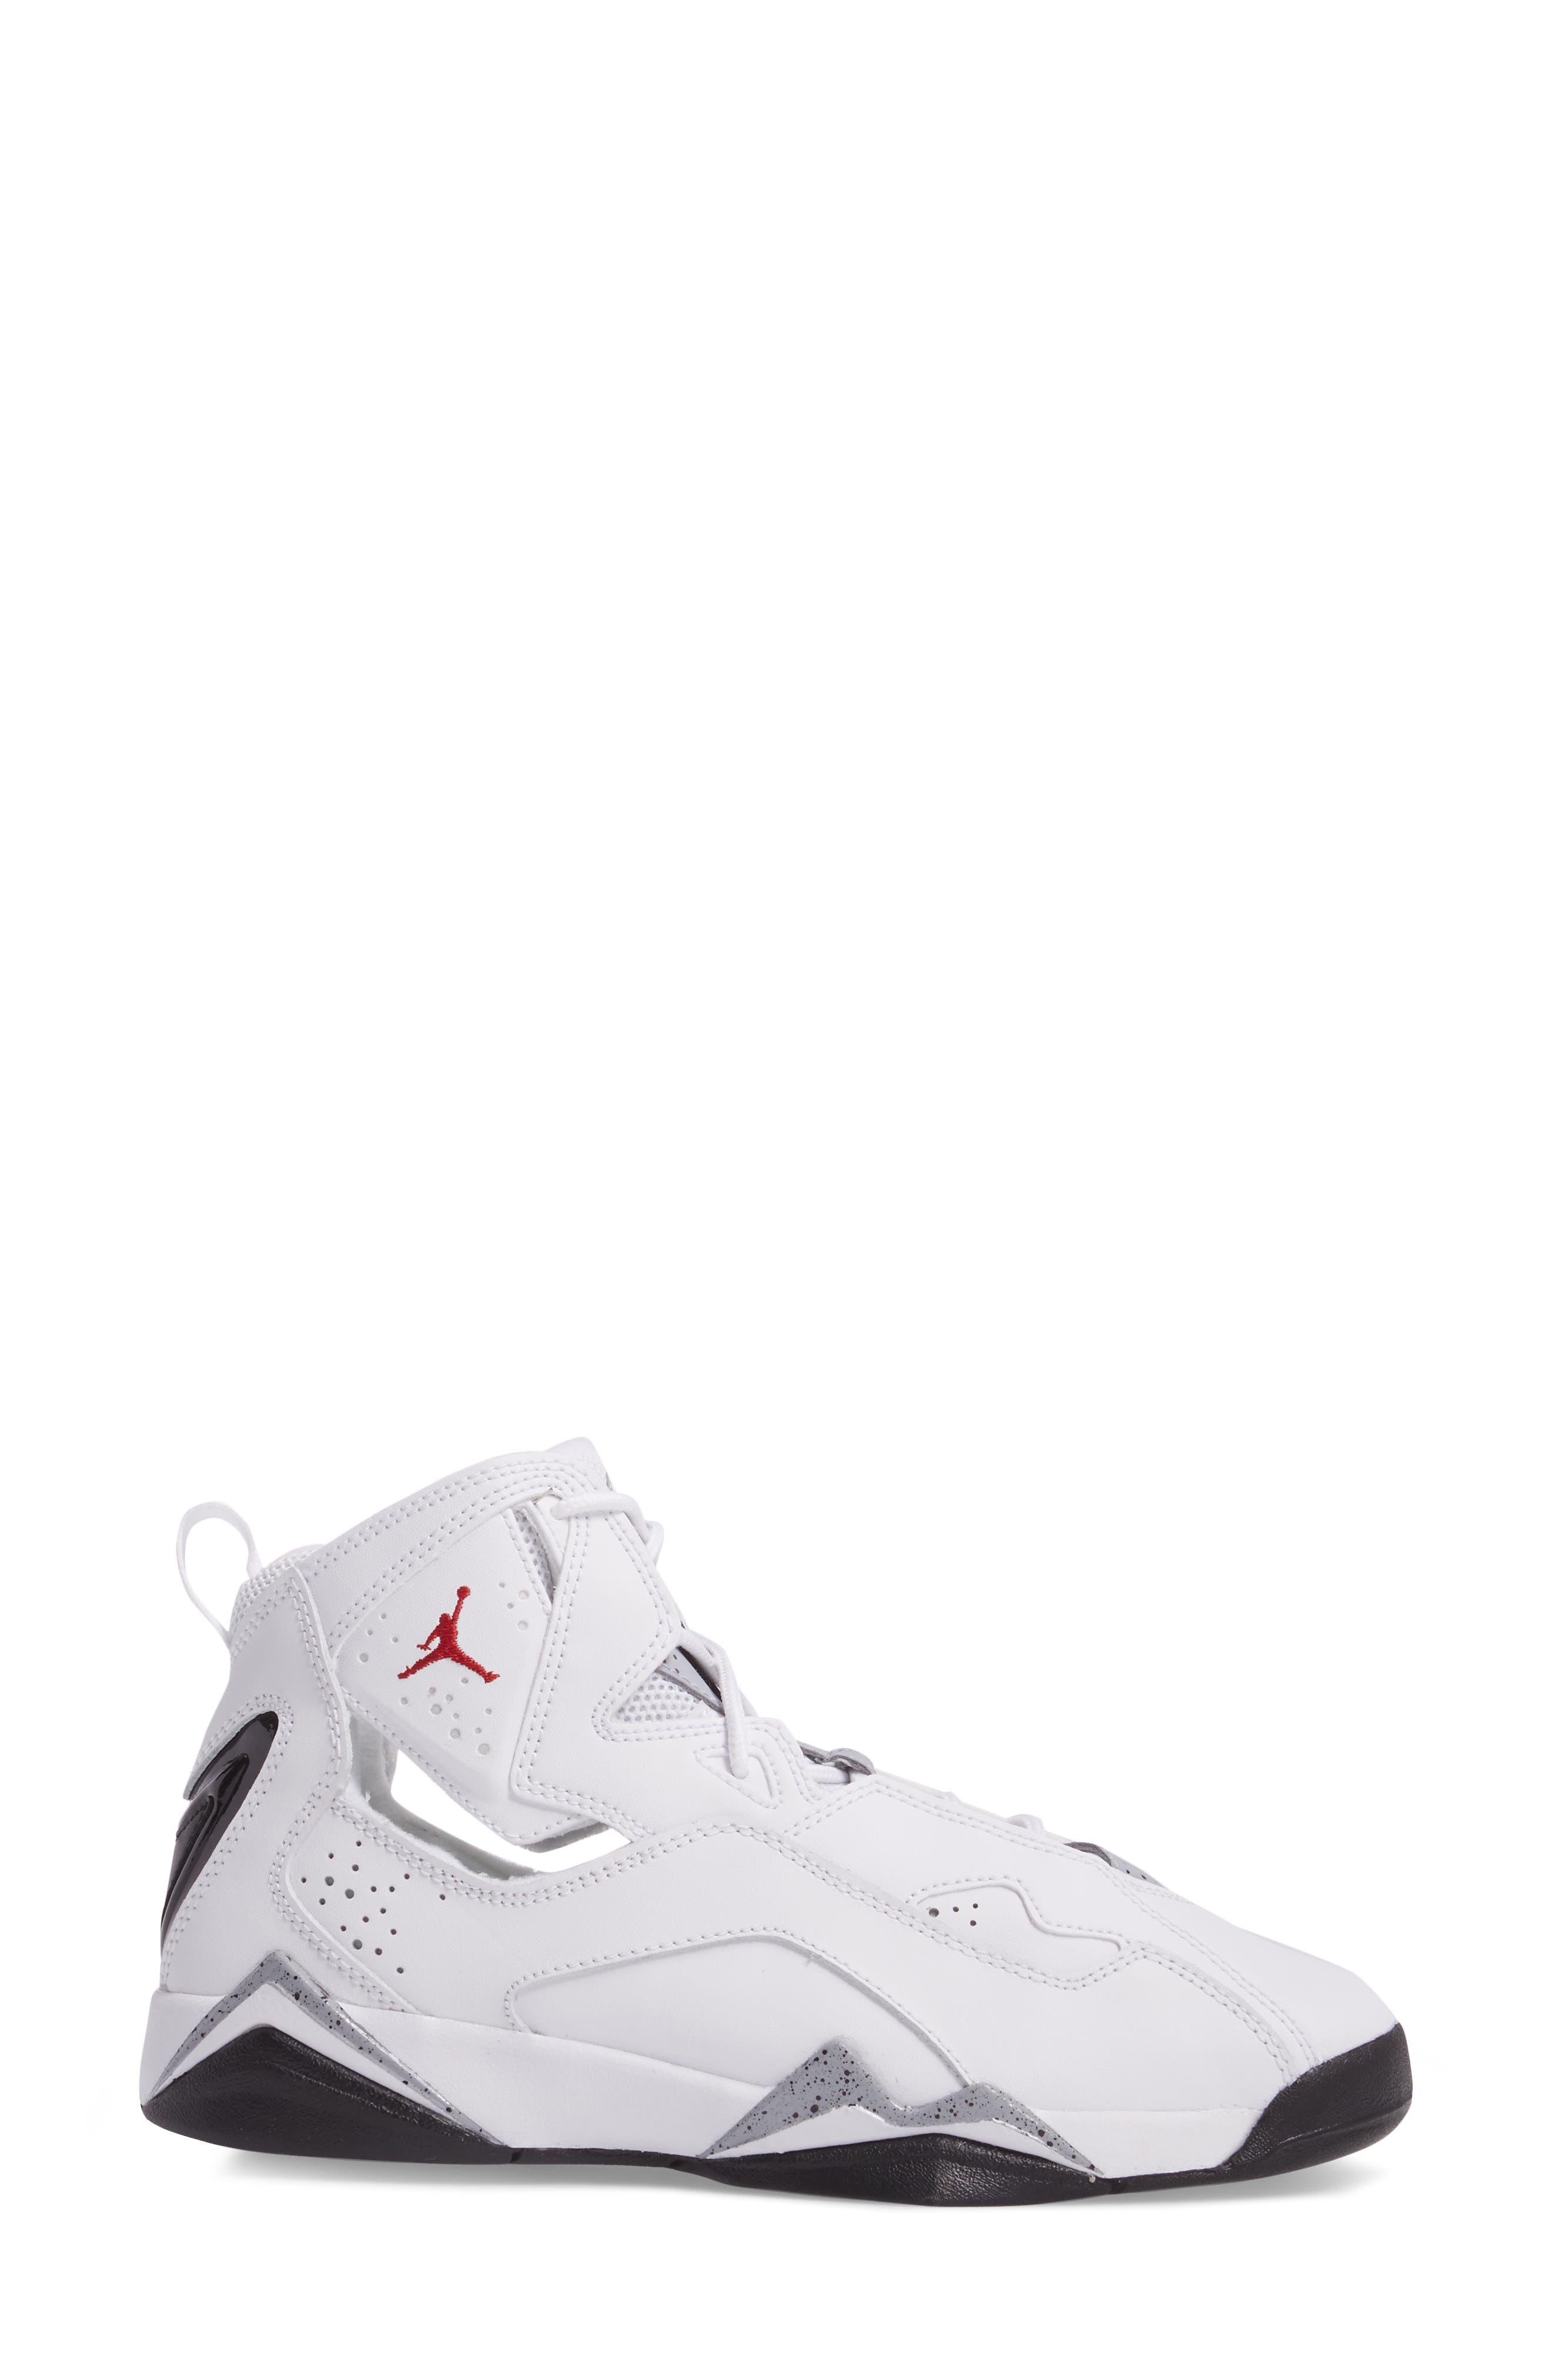 True Flight BG High Top Sneaker,                             Alternate thumbnail 3, color,                             White/ Gym Red/ Wolf Grey